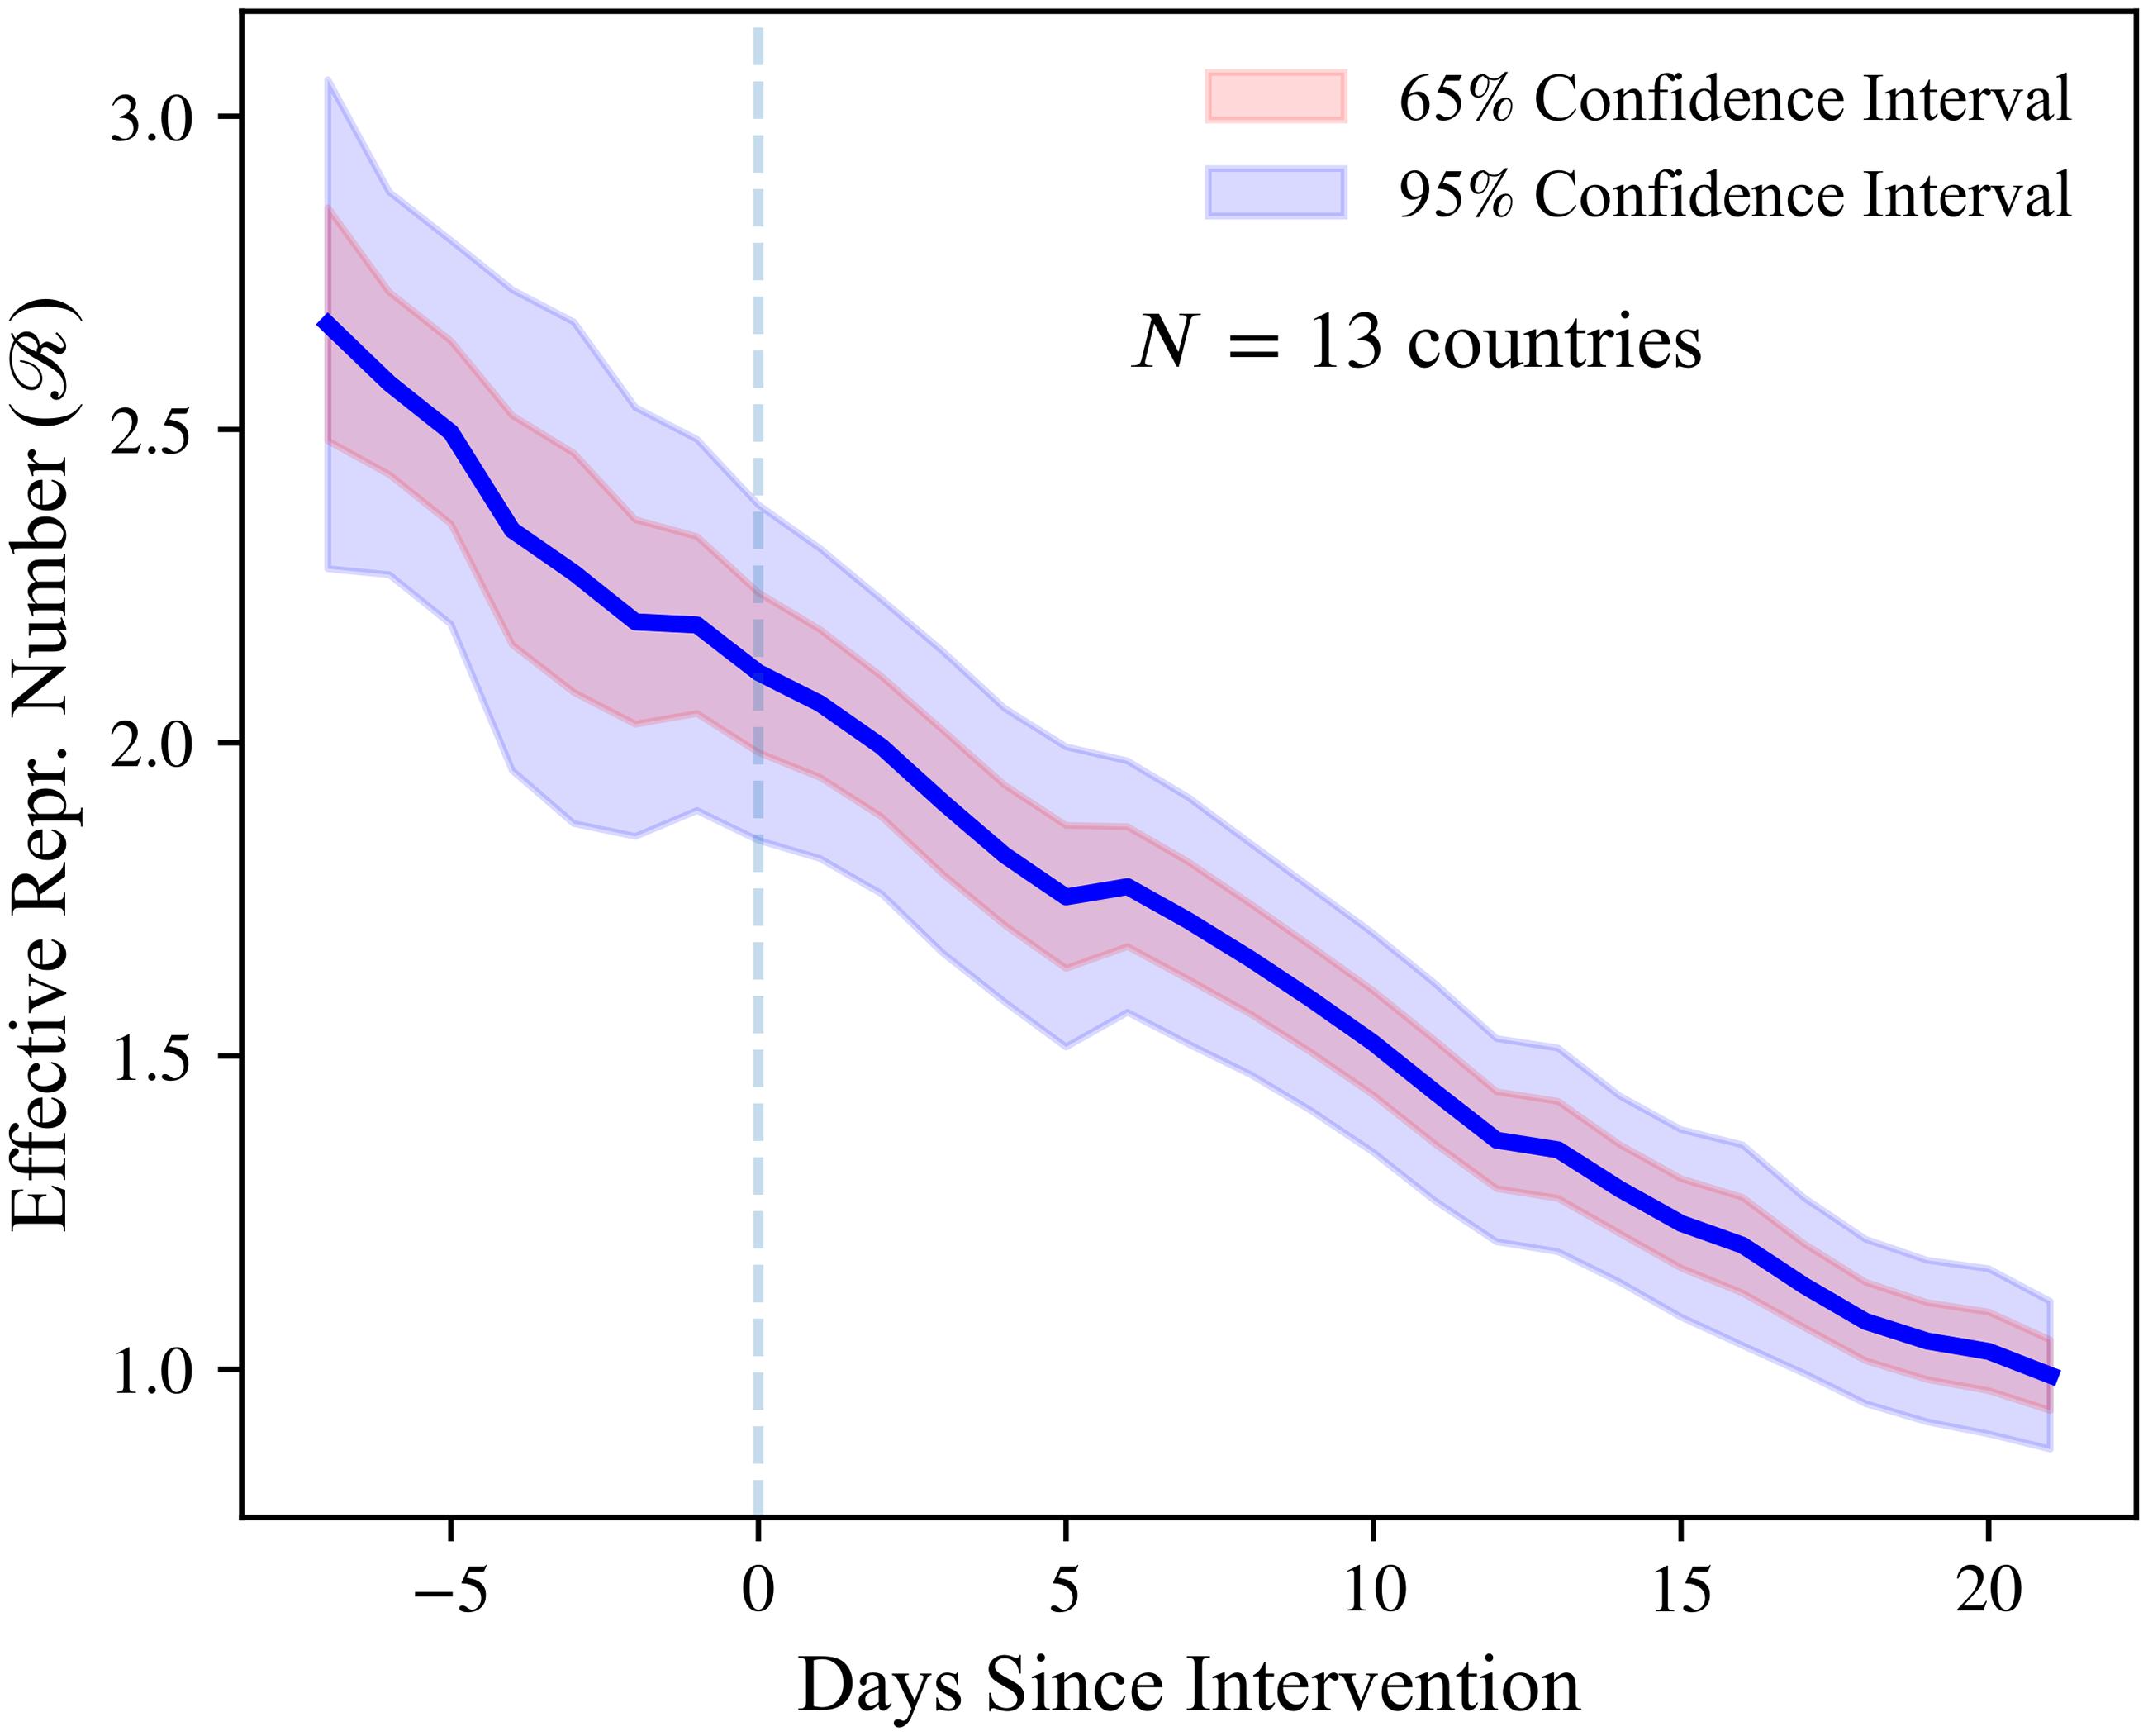 Mobility around introduction of lockdowns (Arroyo-Marioli et al., 2021: https://doi.org/10.1371/journal.pone.0244474)